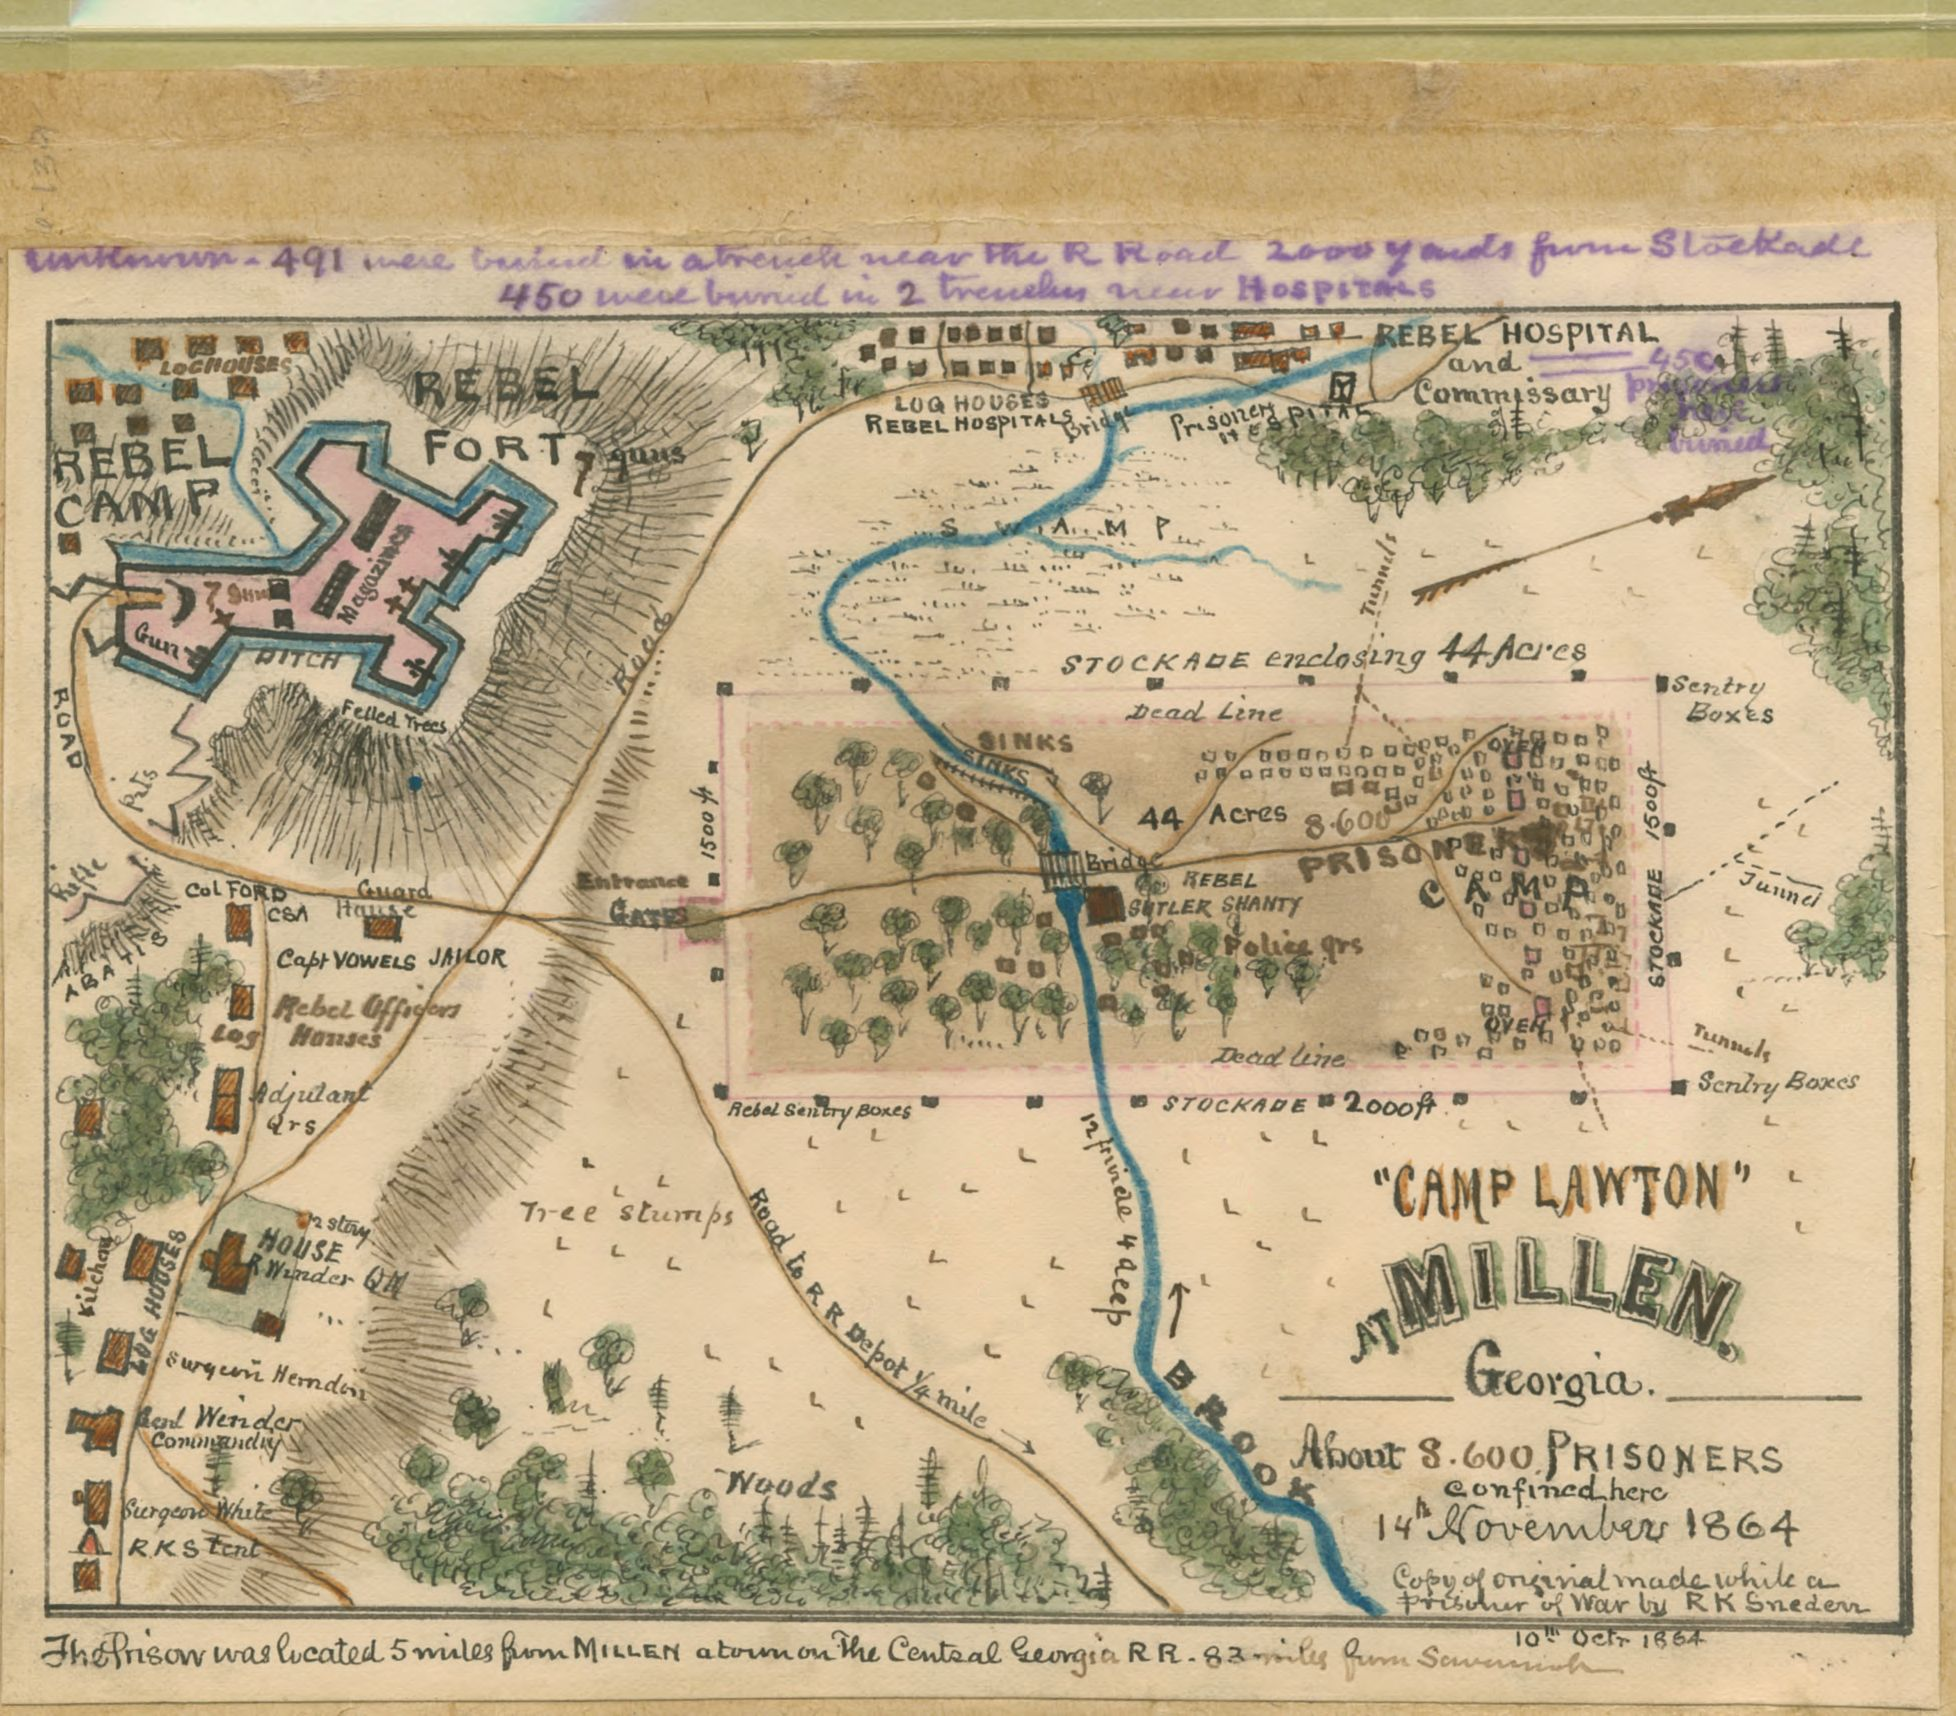 "File ""Camp Lawton"" at Millen Georgia about 8 600 prisoners"